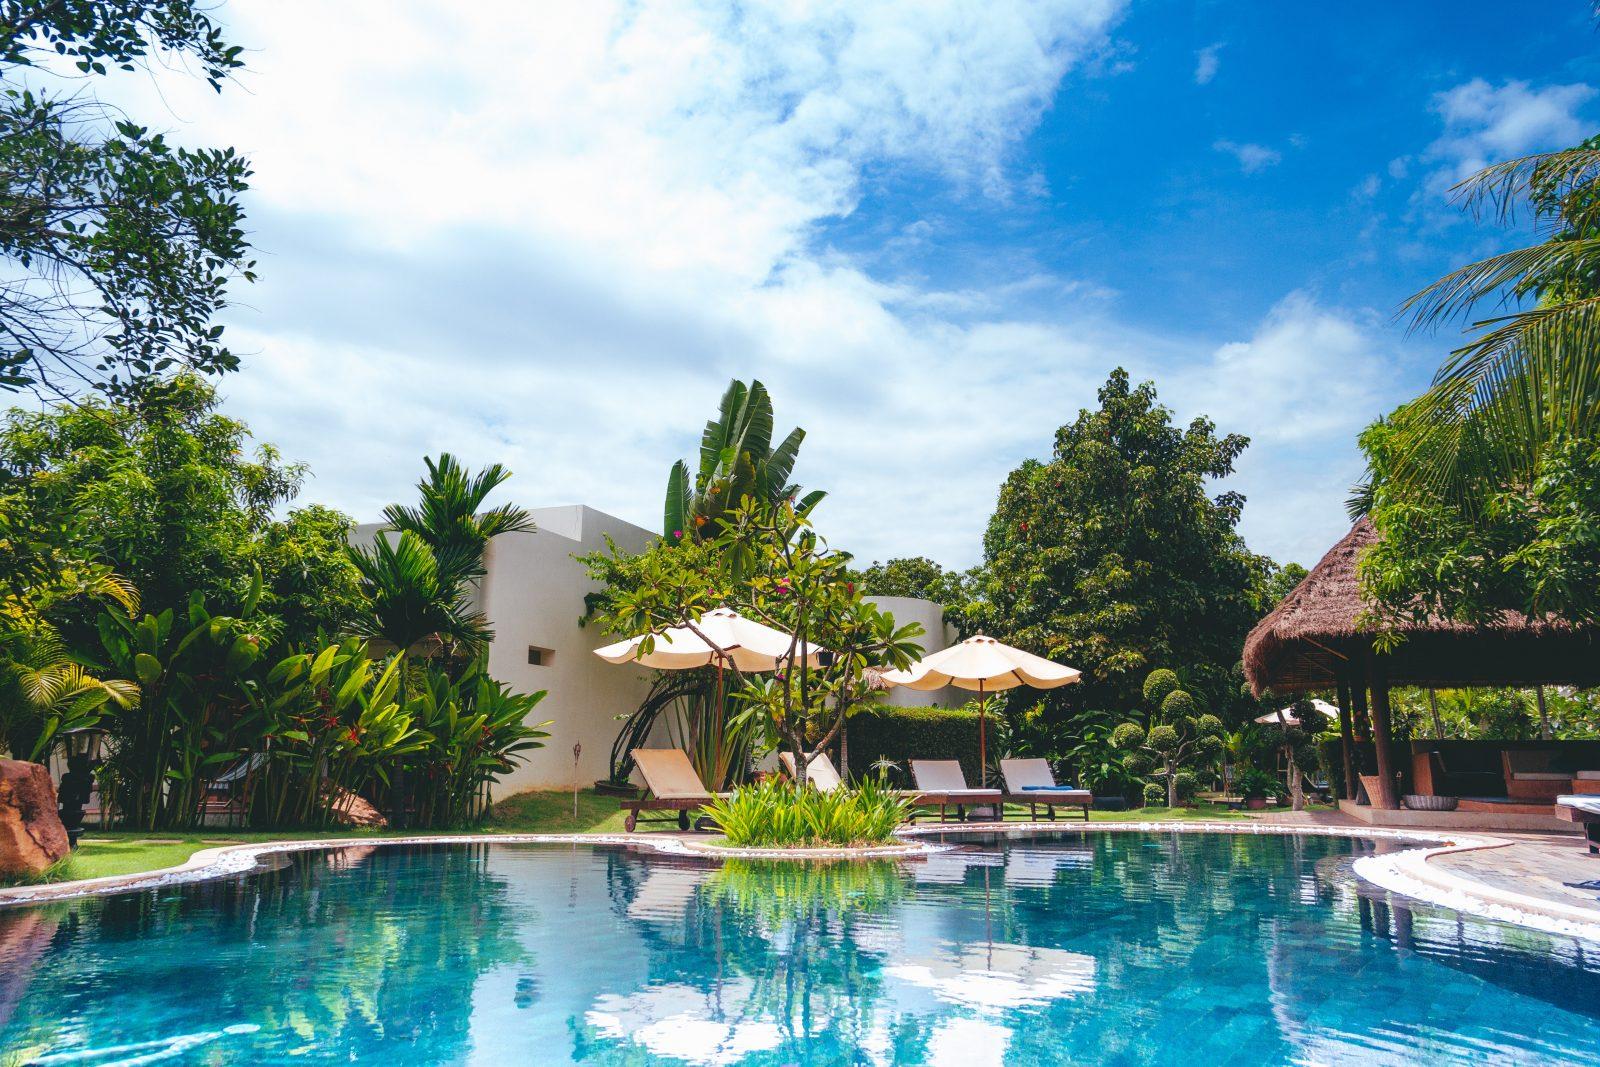 swimming pool garden